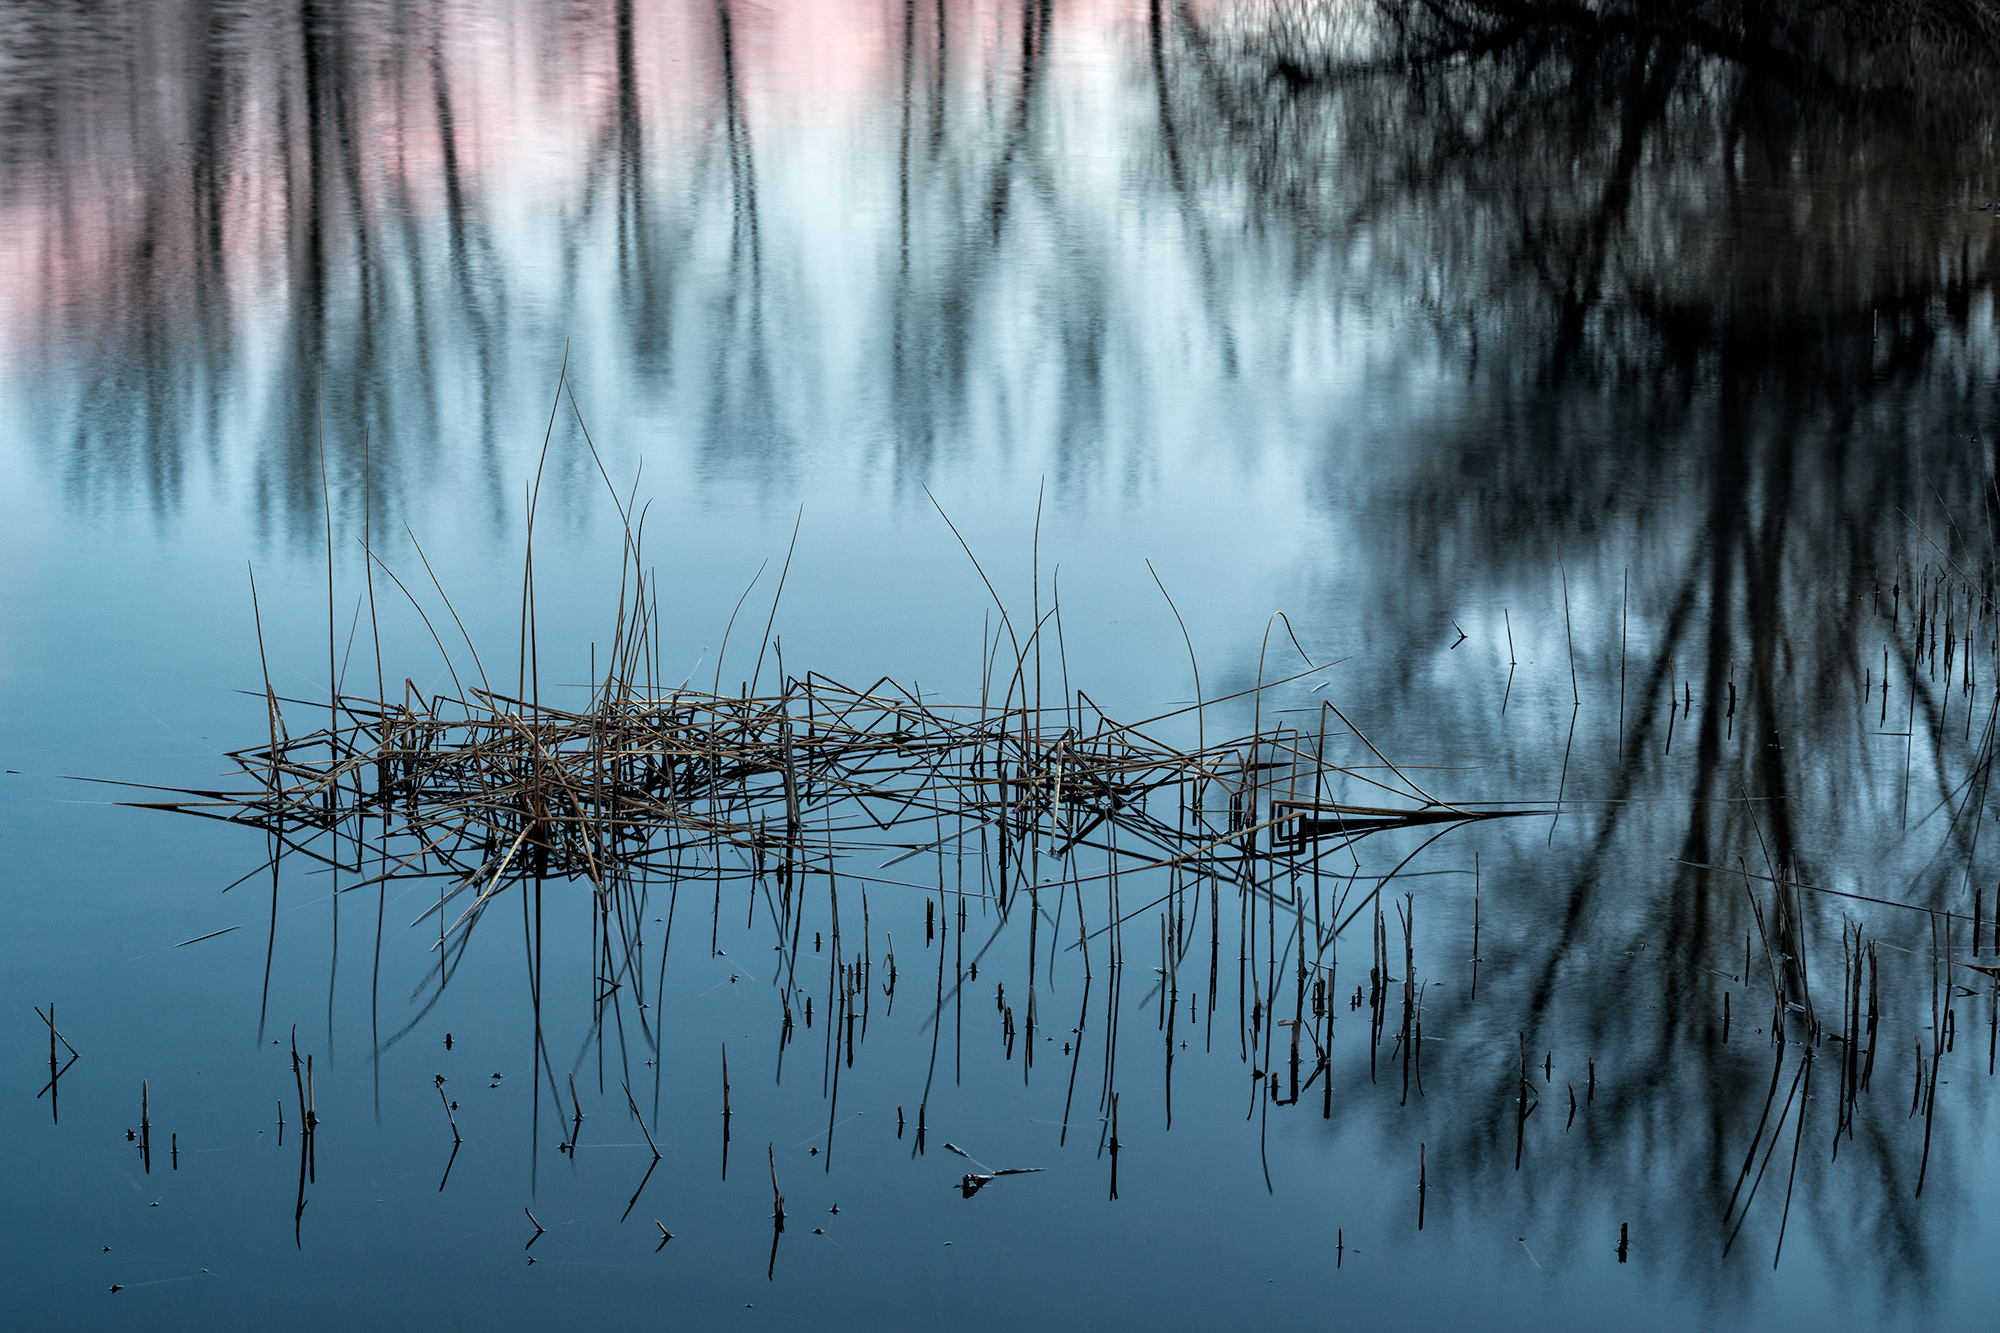 Pink at the Ponds, #3. Walden Ponds, Colorado, 2016